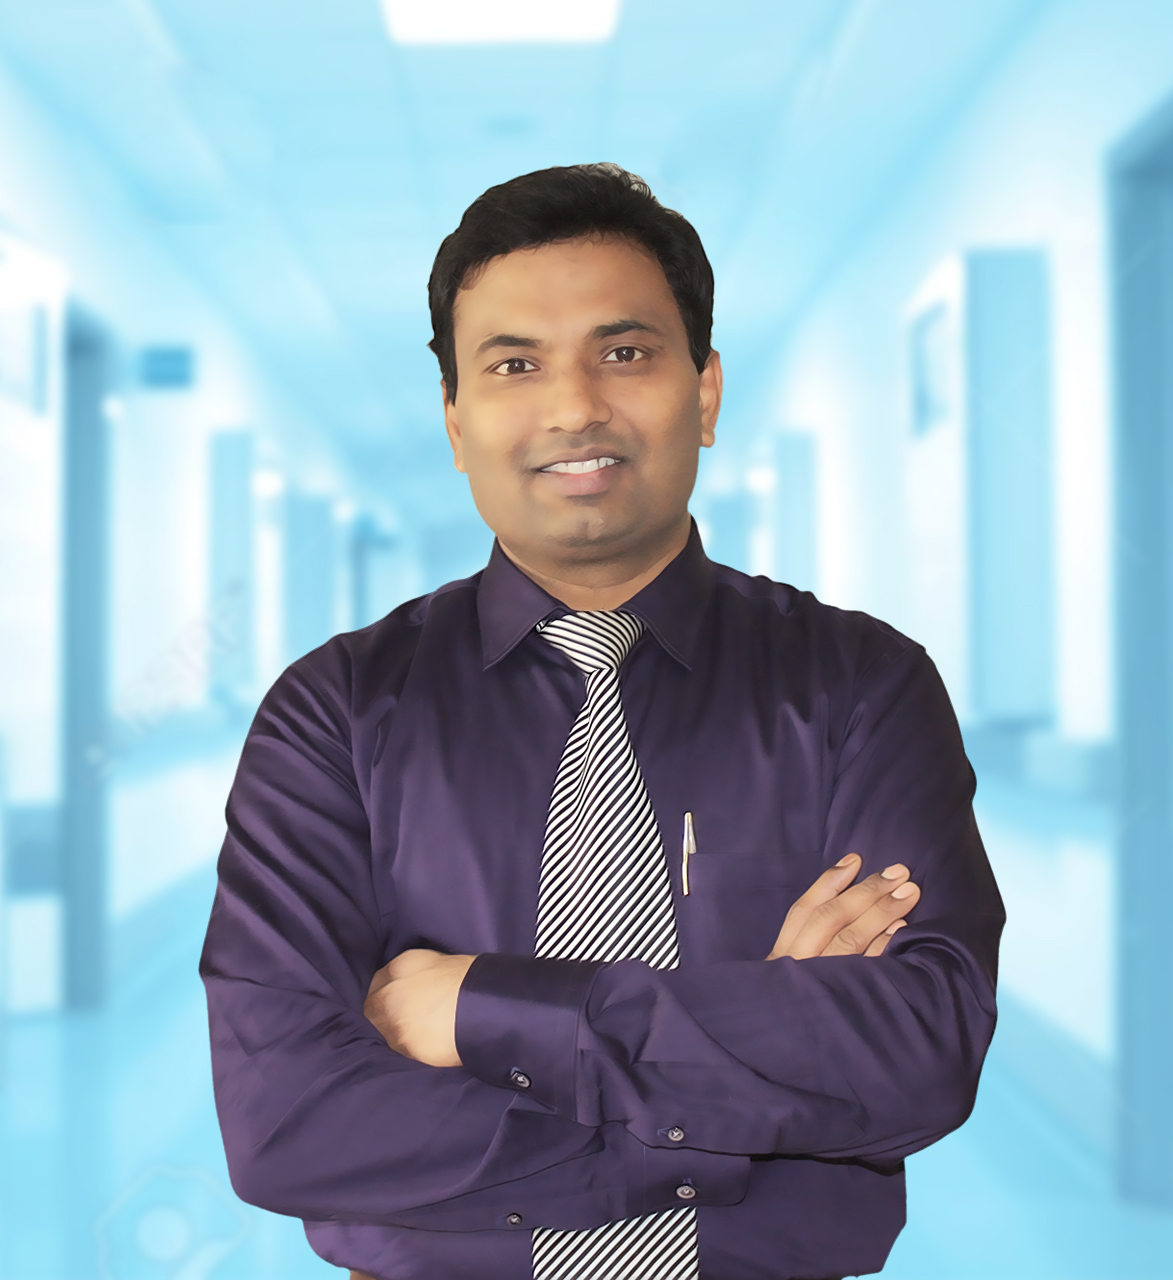 About Dr. Sunil Dachepalli